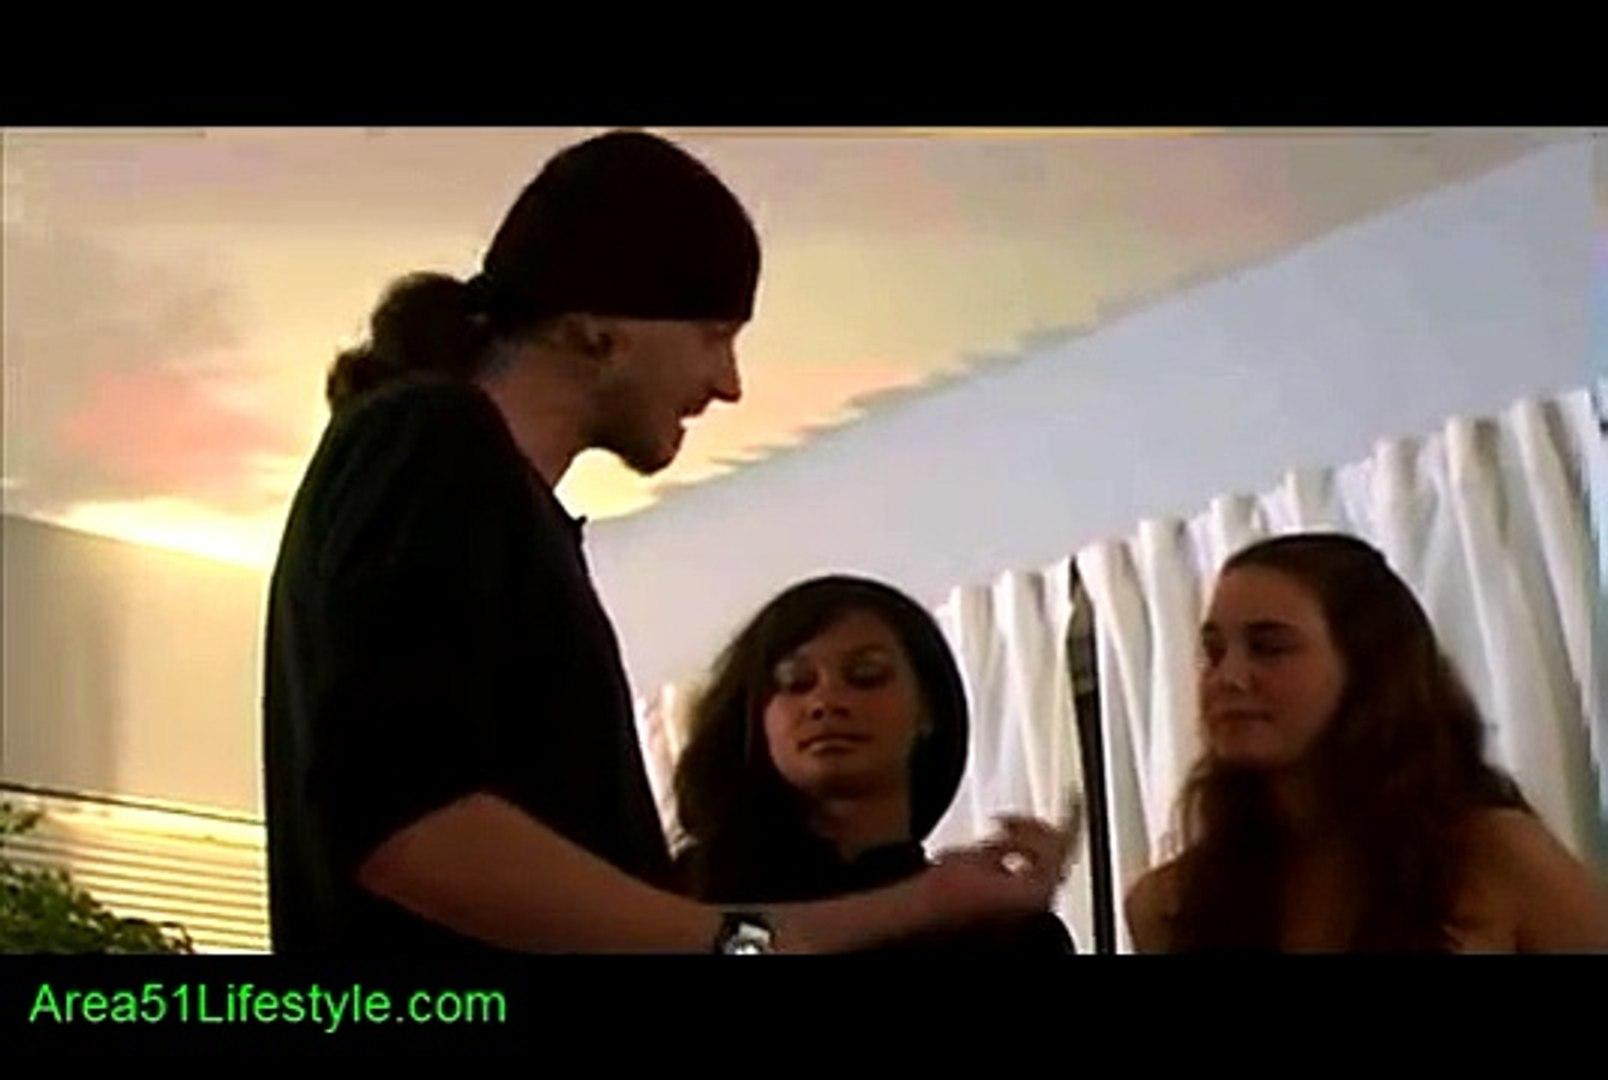 Mystery Method PUA (Pickup Artist) Live Mystery Method Training w/ Women -  Interrupts - video dailymotion